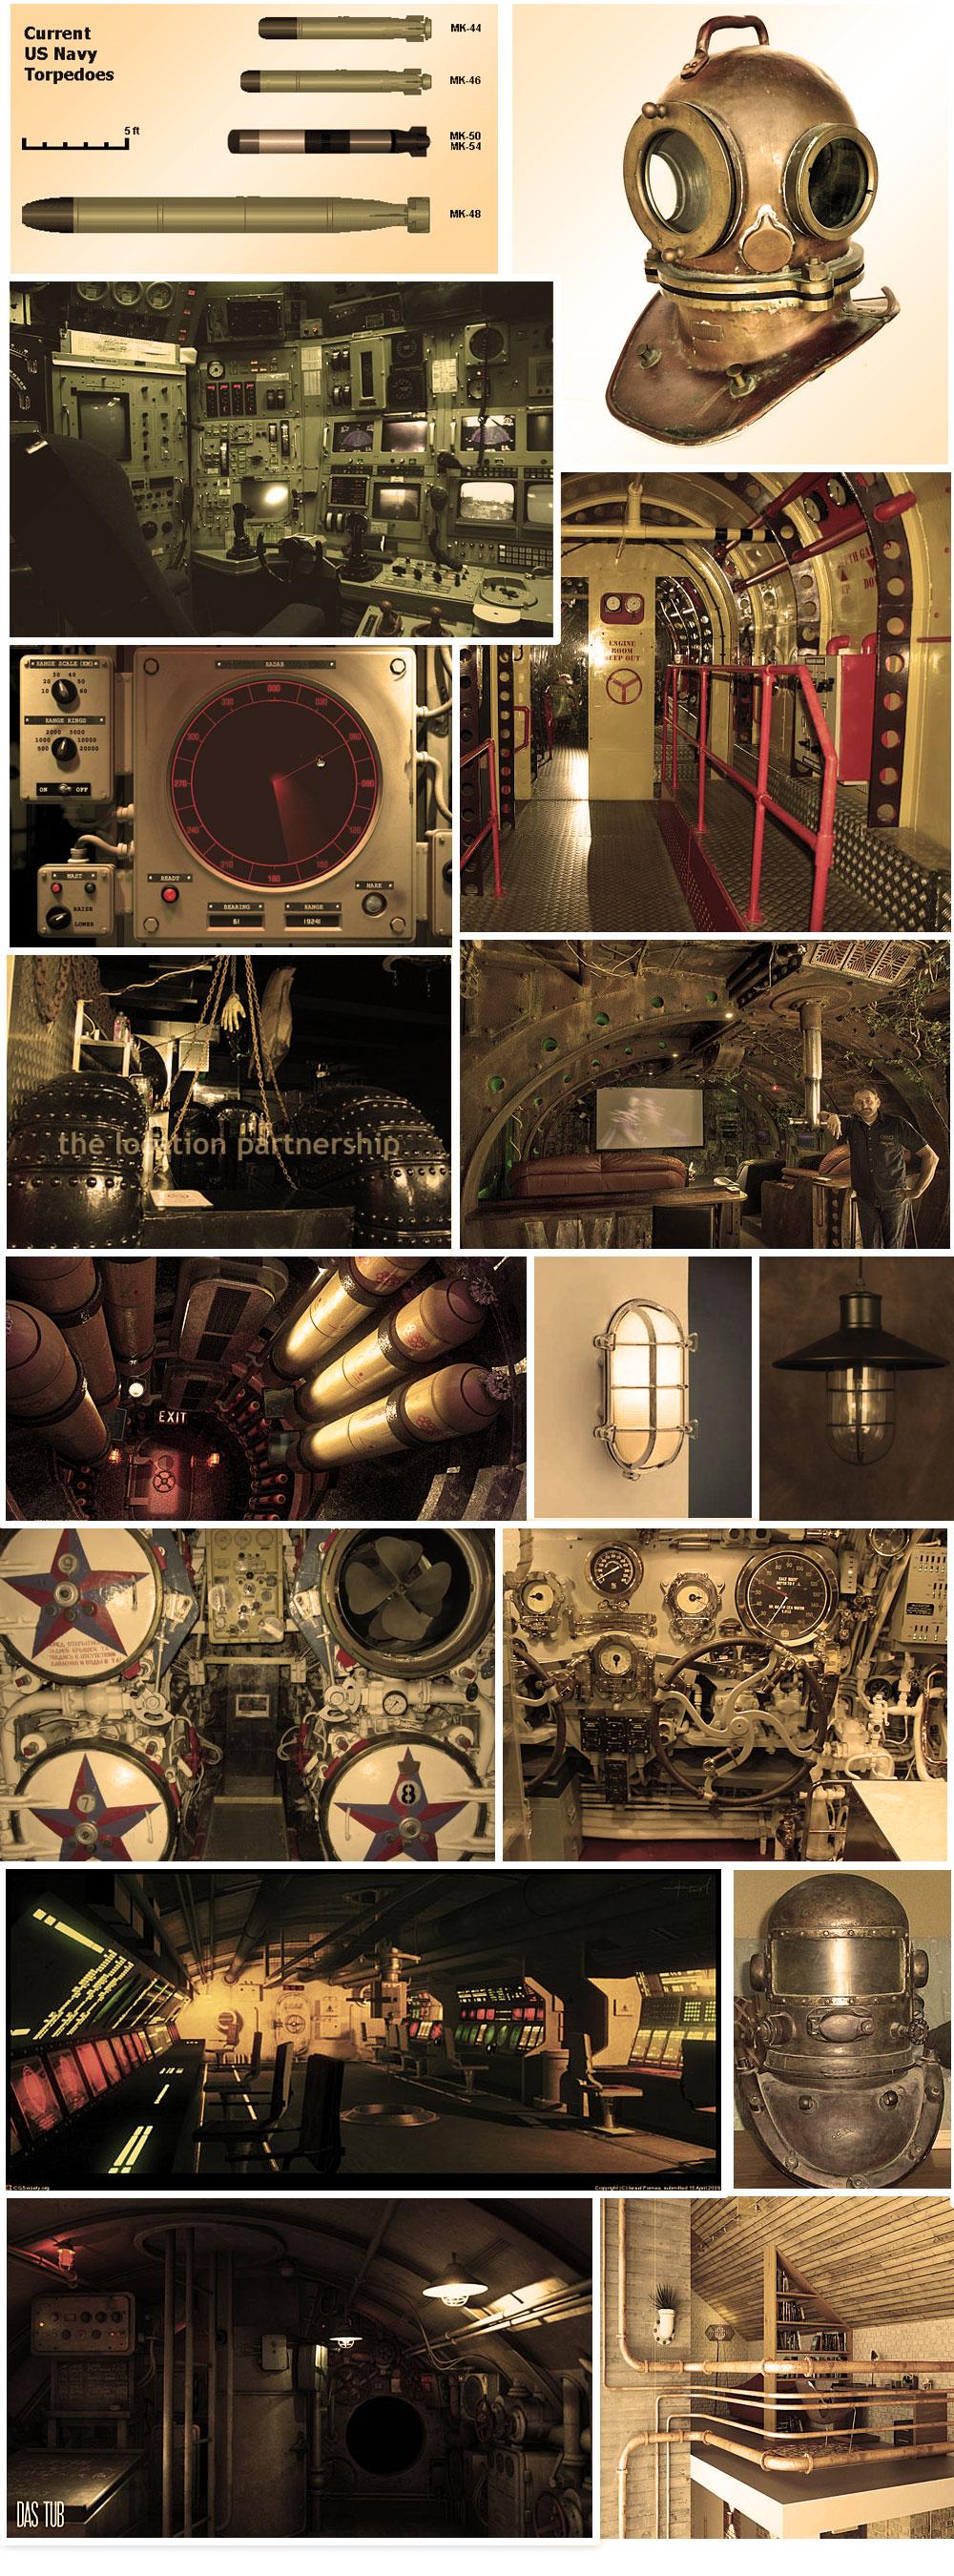 http://6sense.ro/WP/wp-content/uploads/2015/05/Submarine-Club-Cluj-schite-concept-design-interior-documentation22.jpg